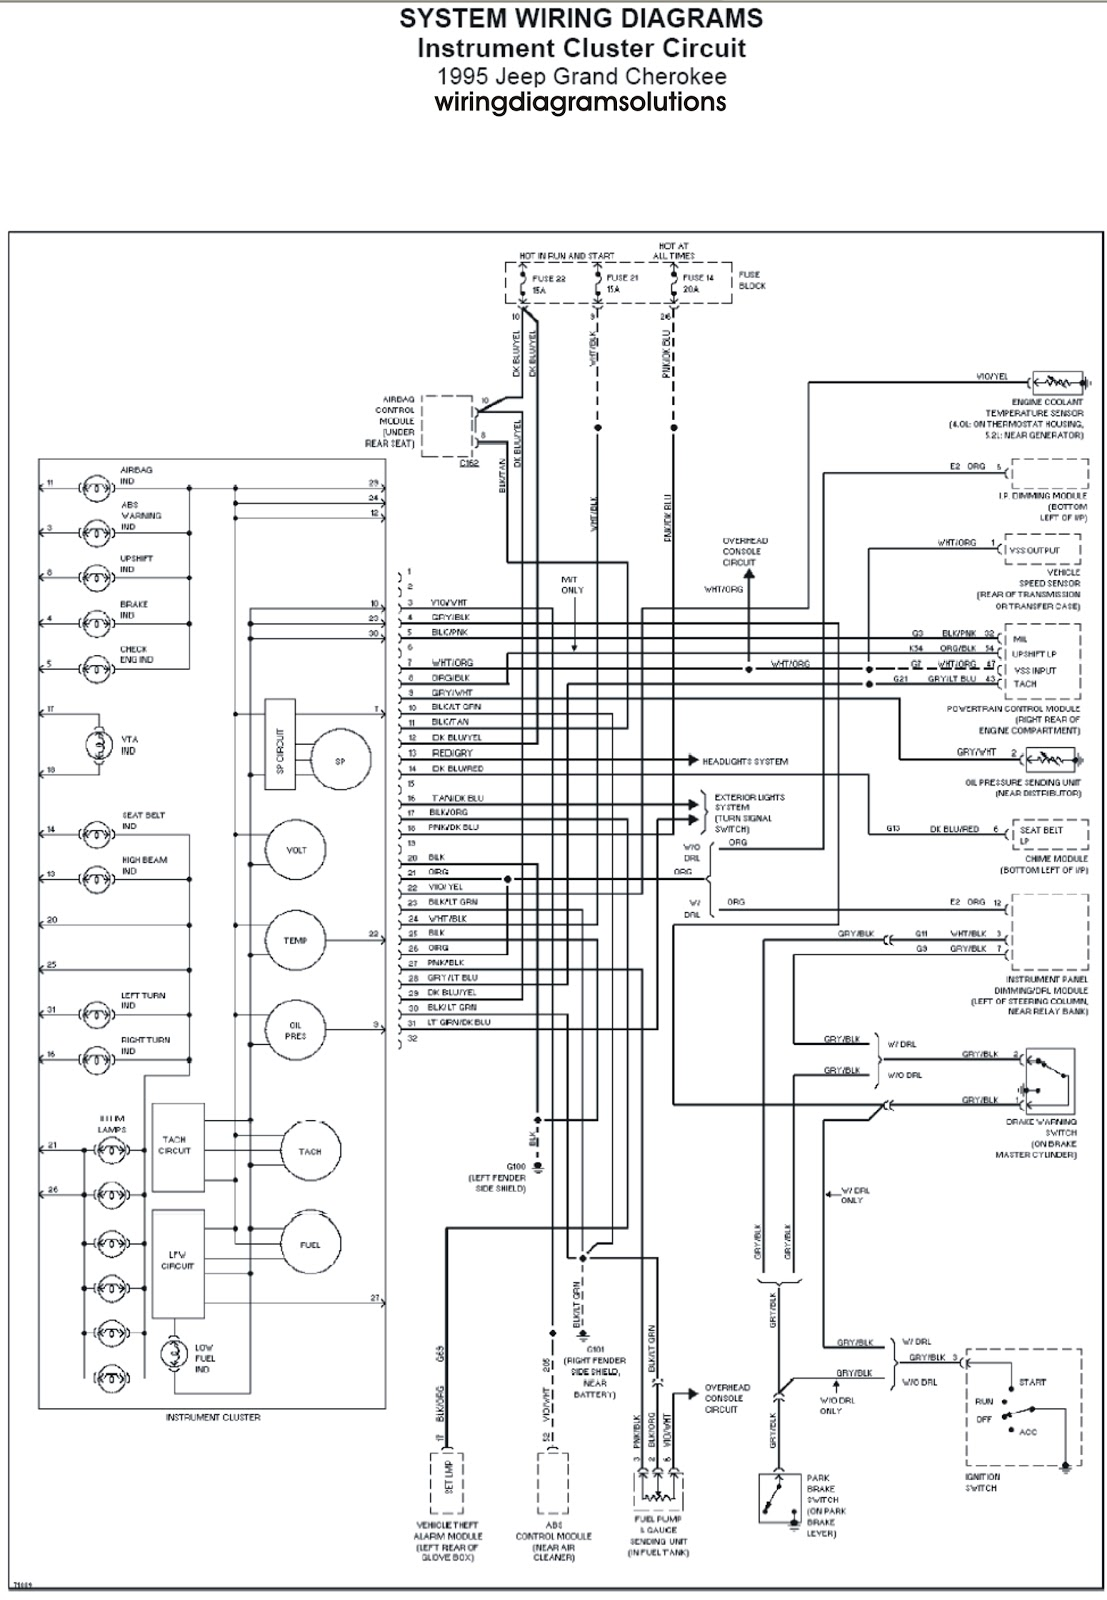 Window Wiring Diagram 97 Jeep - Wiring Diagrams List on